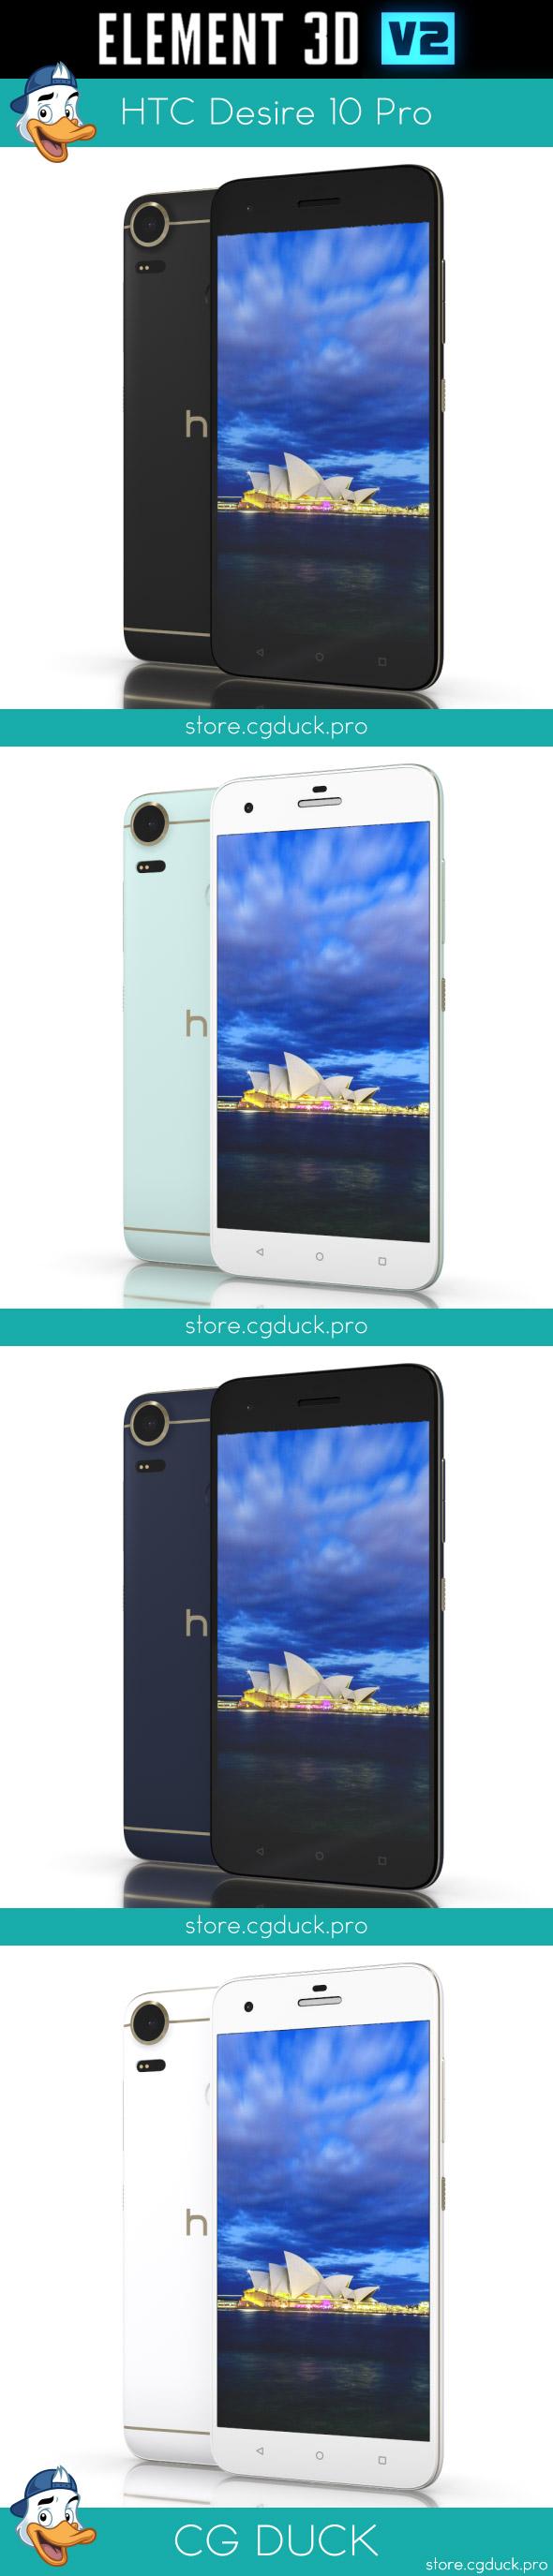 HTC Desire 10 Pro for Element 3D - 3DOcean Item for Sale